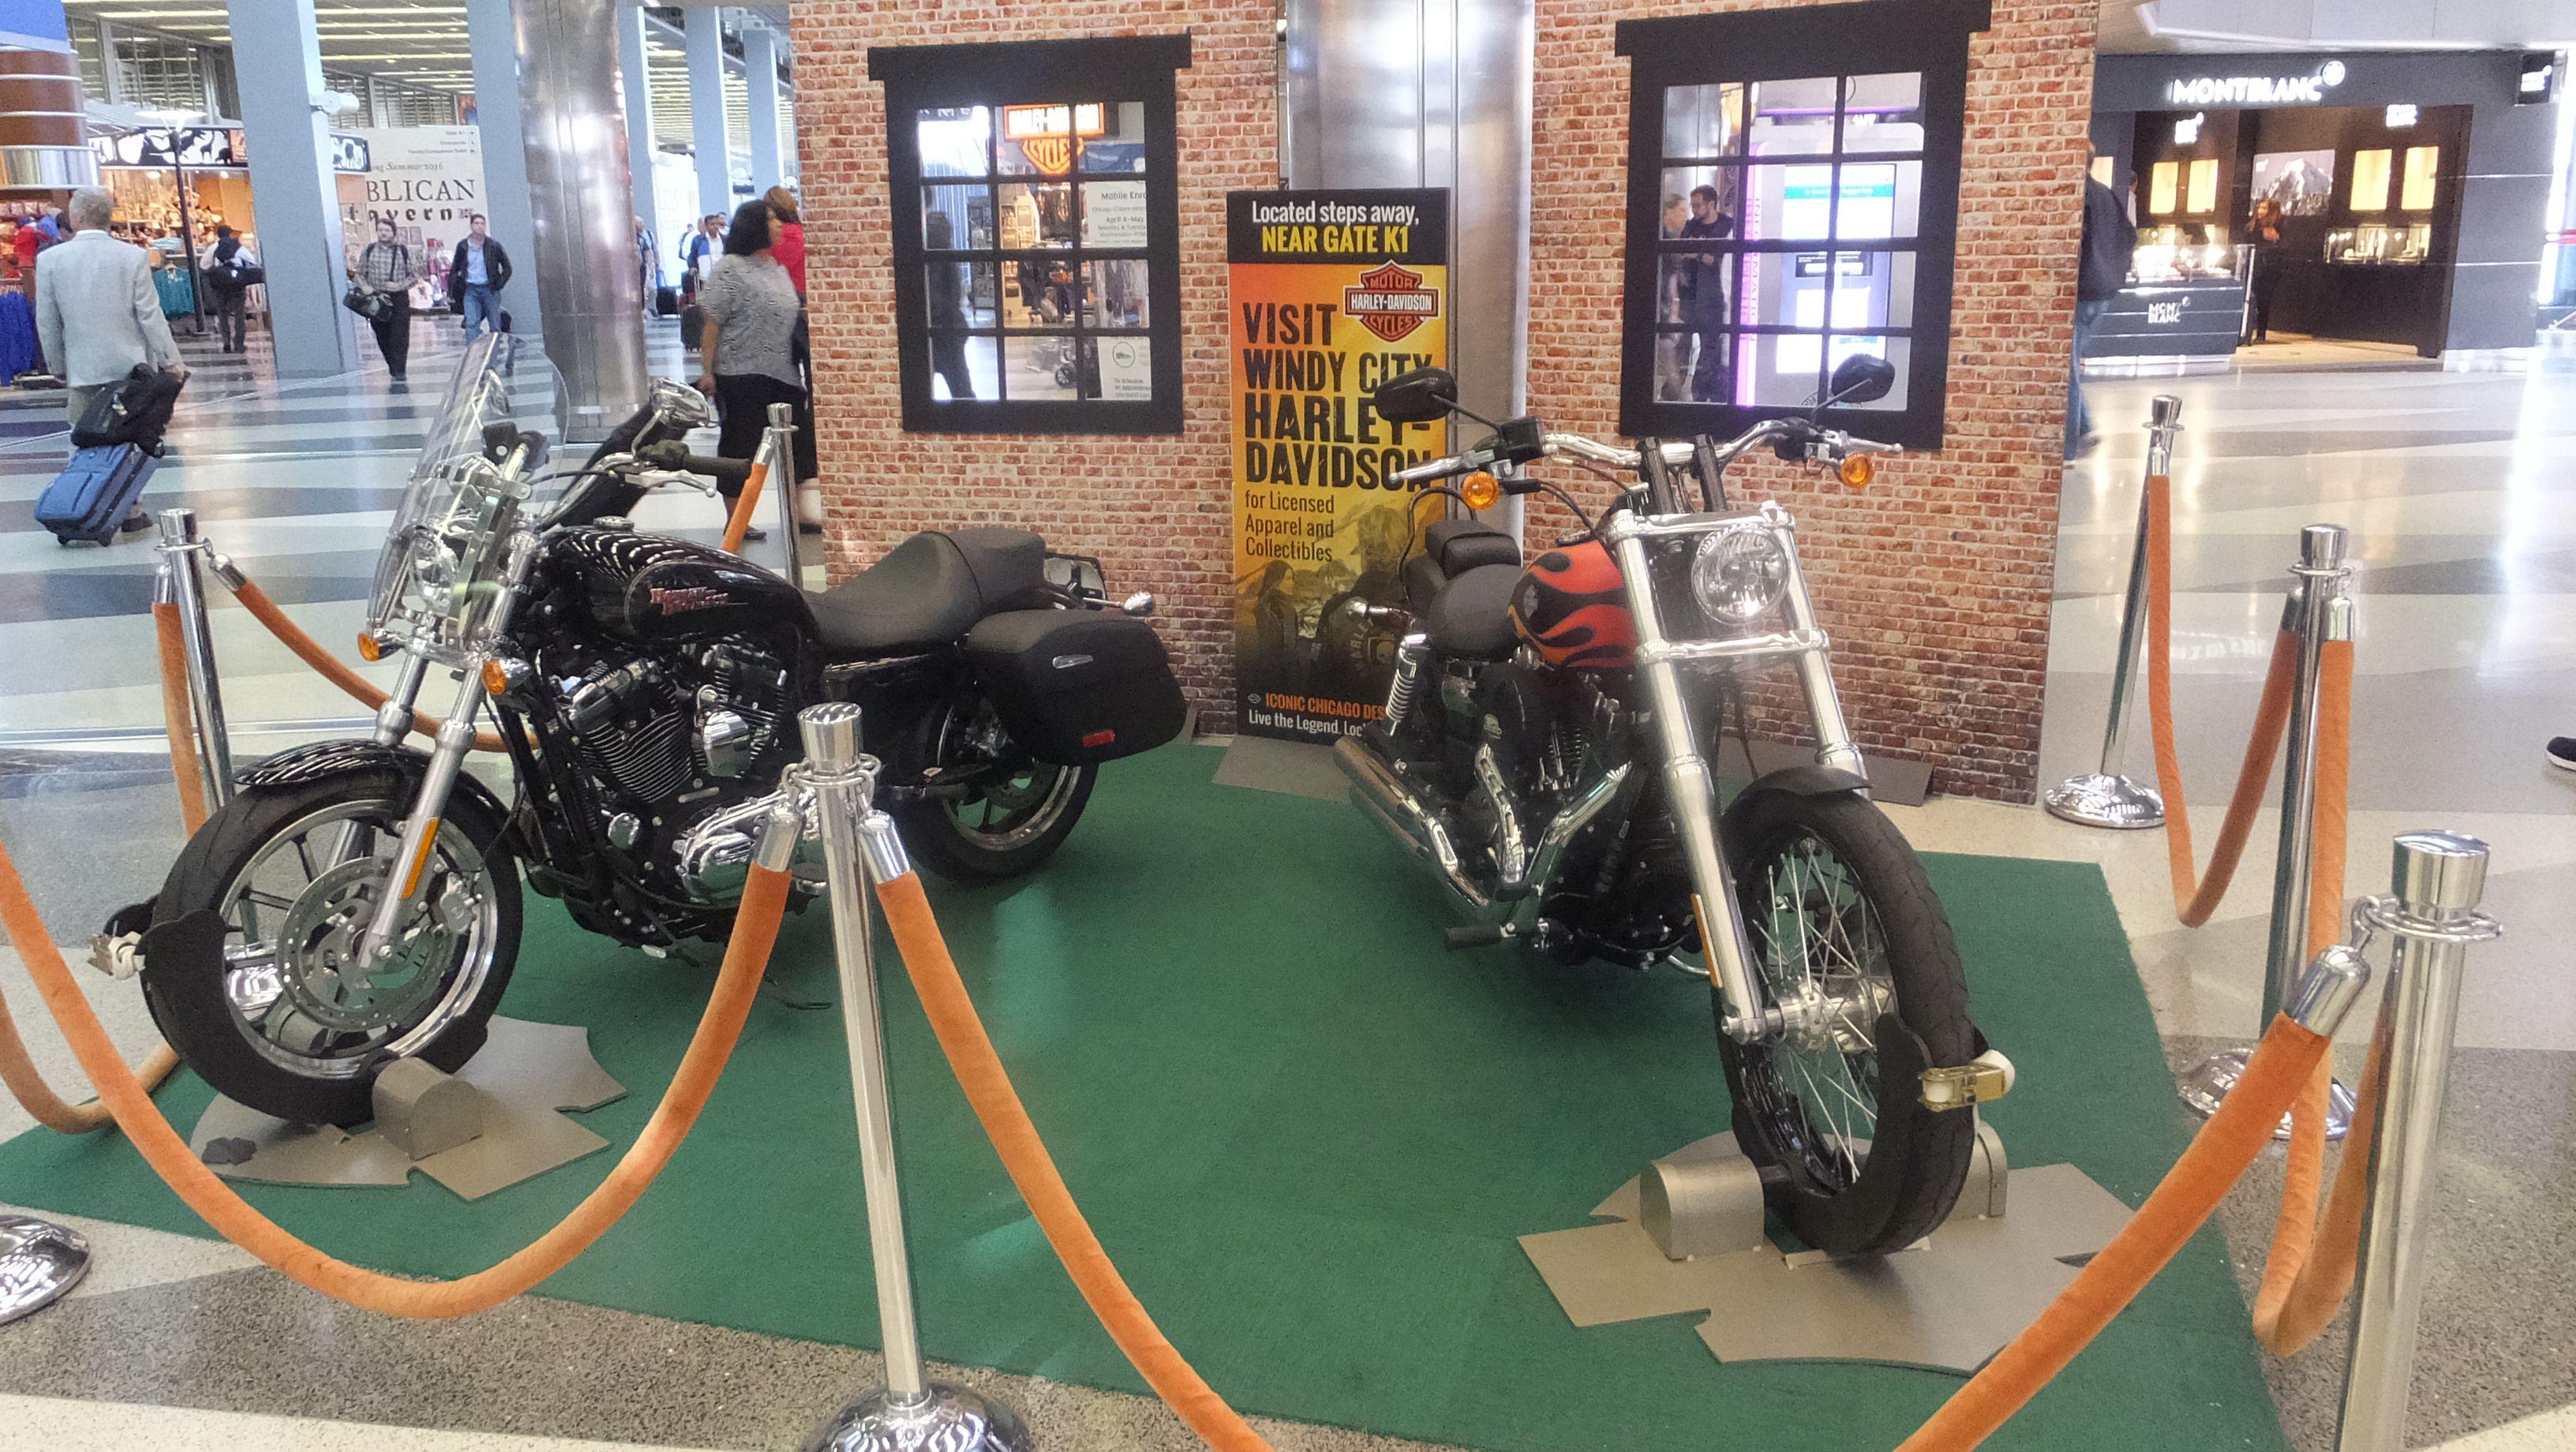 O Hare S Harley Davidson Motorcycle Display Hits The Road Tonight But The Harley Davidson Store Is Sti Harley Davidson Store Airport Shopping Harley Davidson